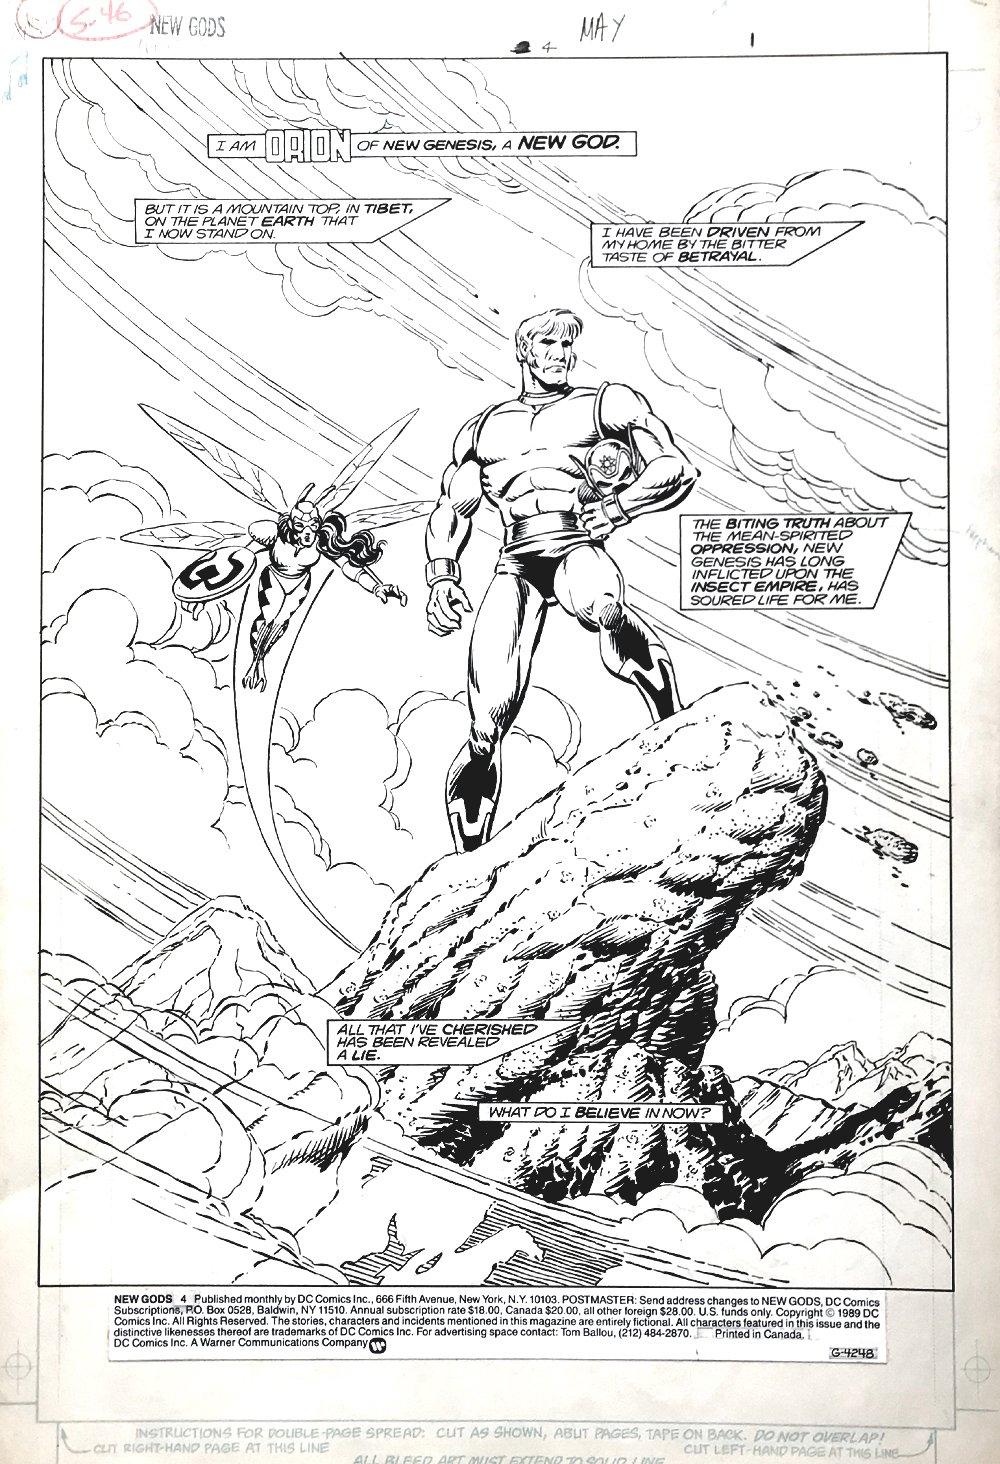 New Gods #4 p 1 SPLASH (ORION & FORAGER!) Large Art - 1984